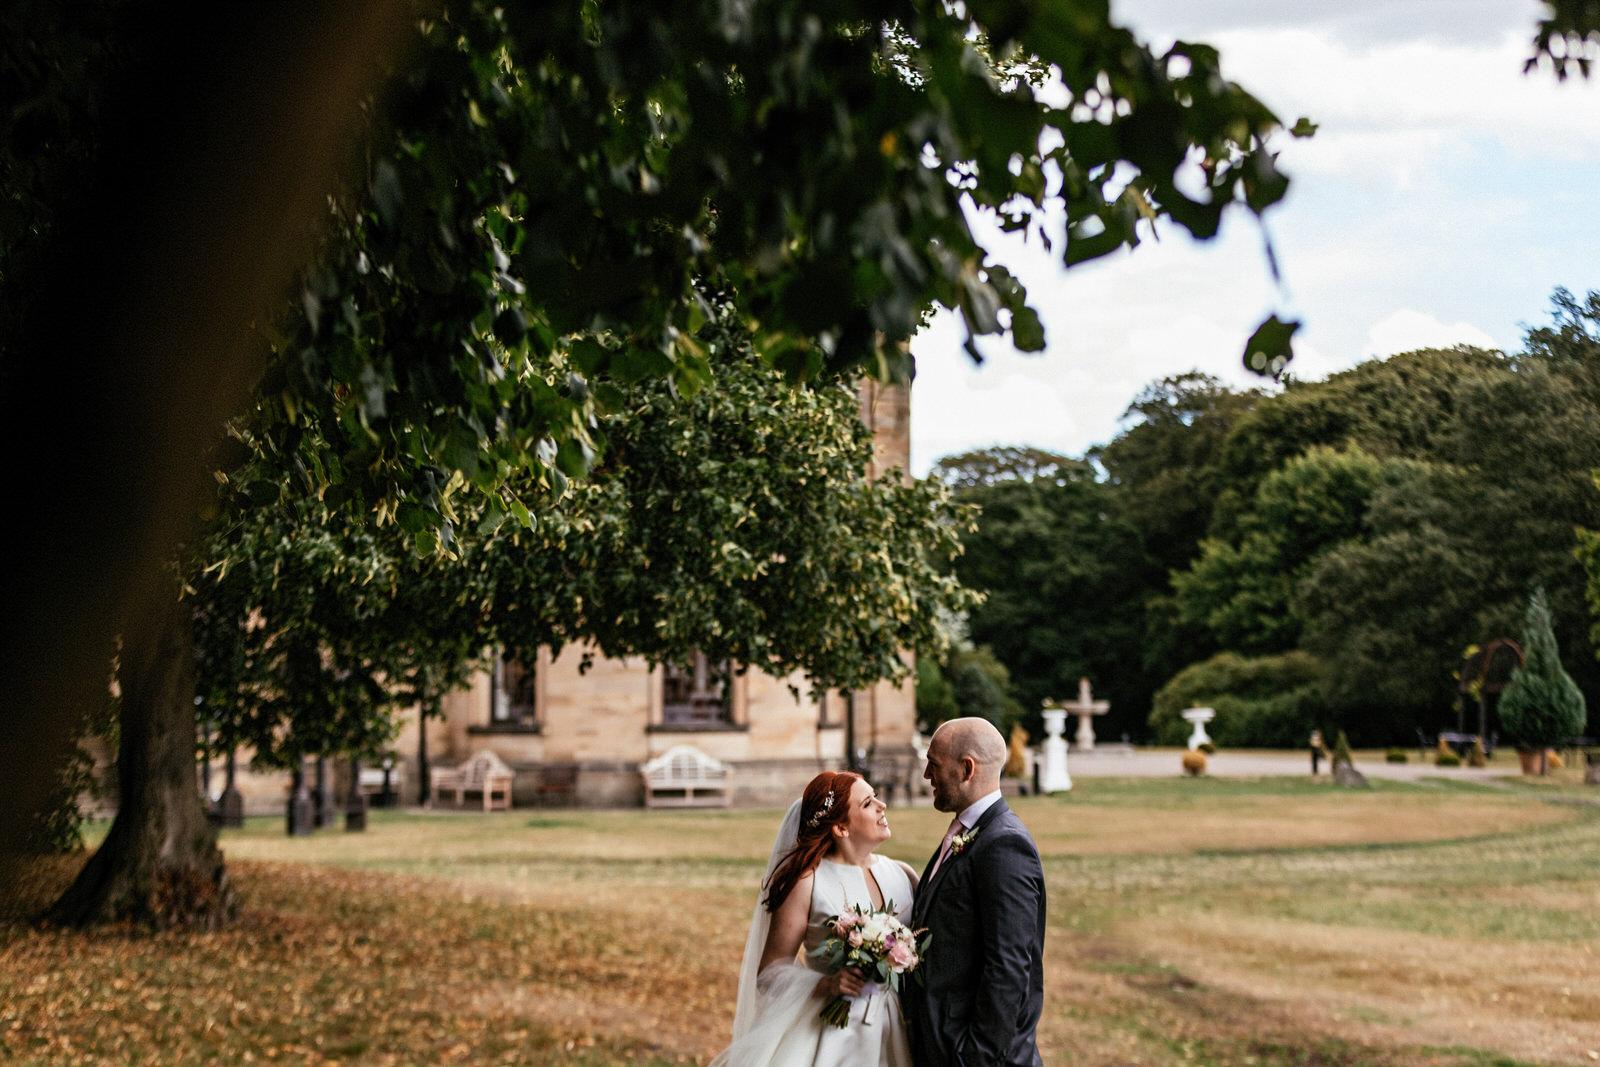 Beamish-Hall-Wedding-Photographer-048.jpg